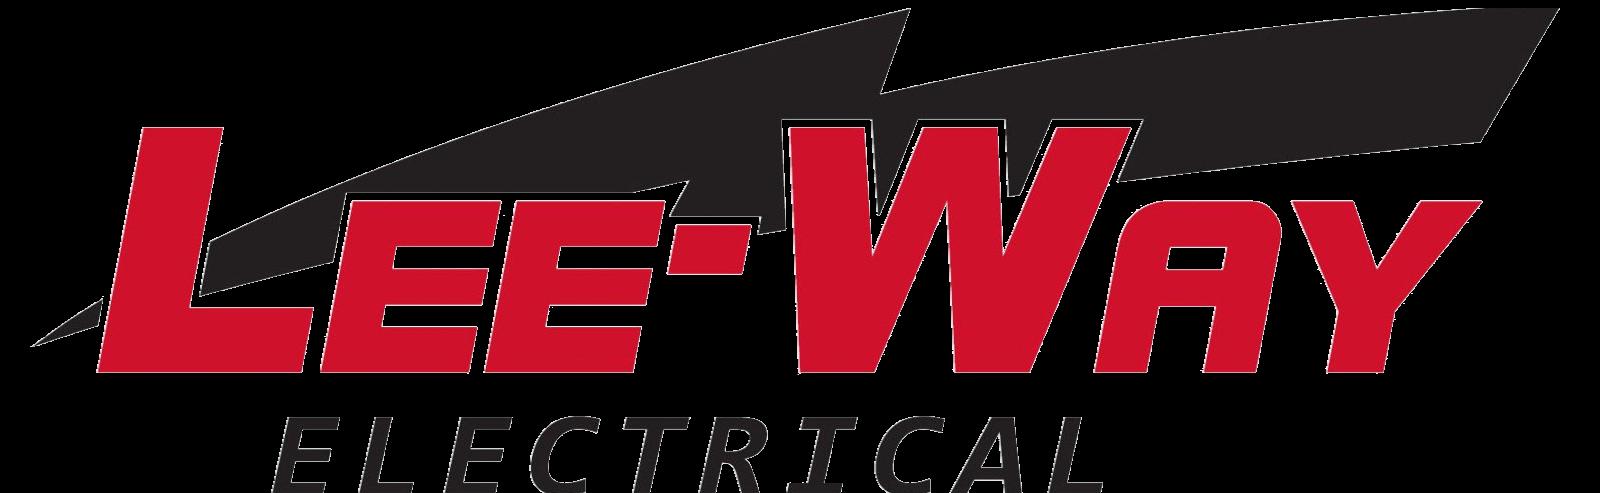 Leeway Electrical LLC